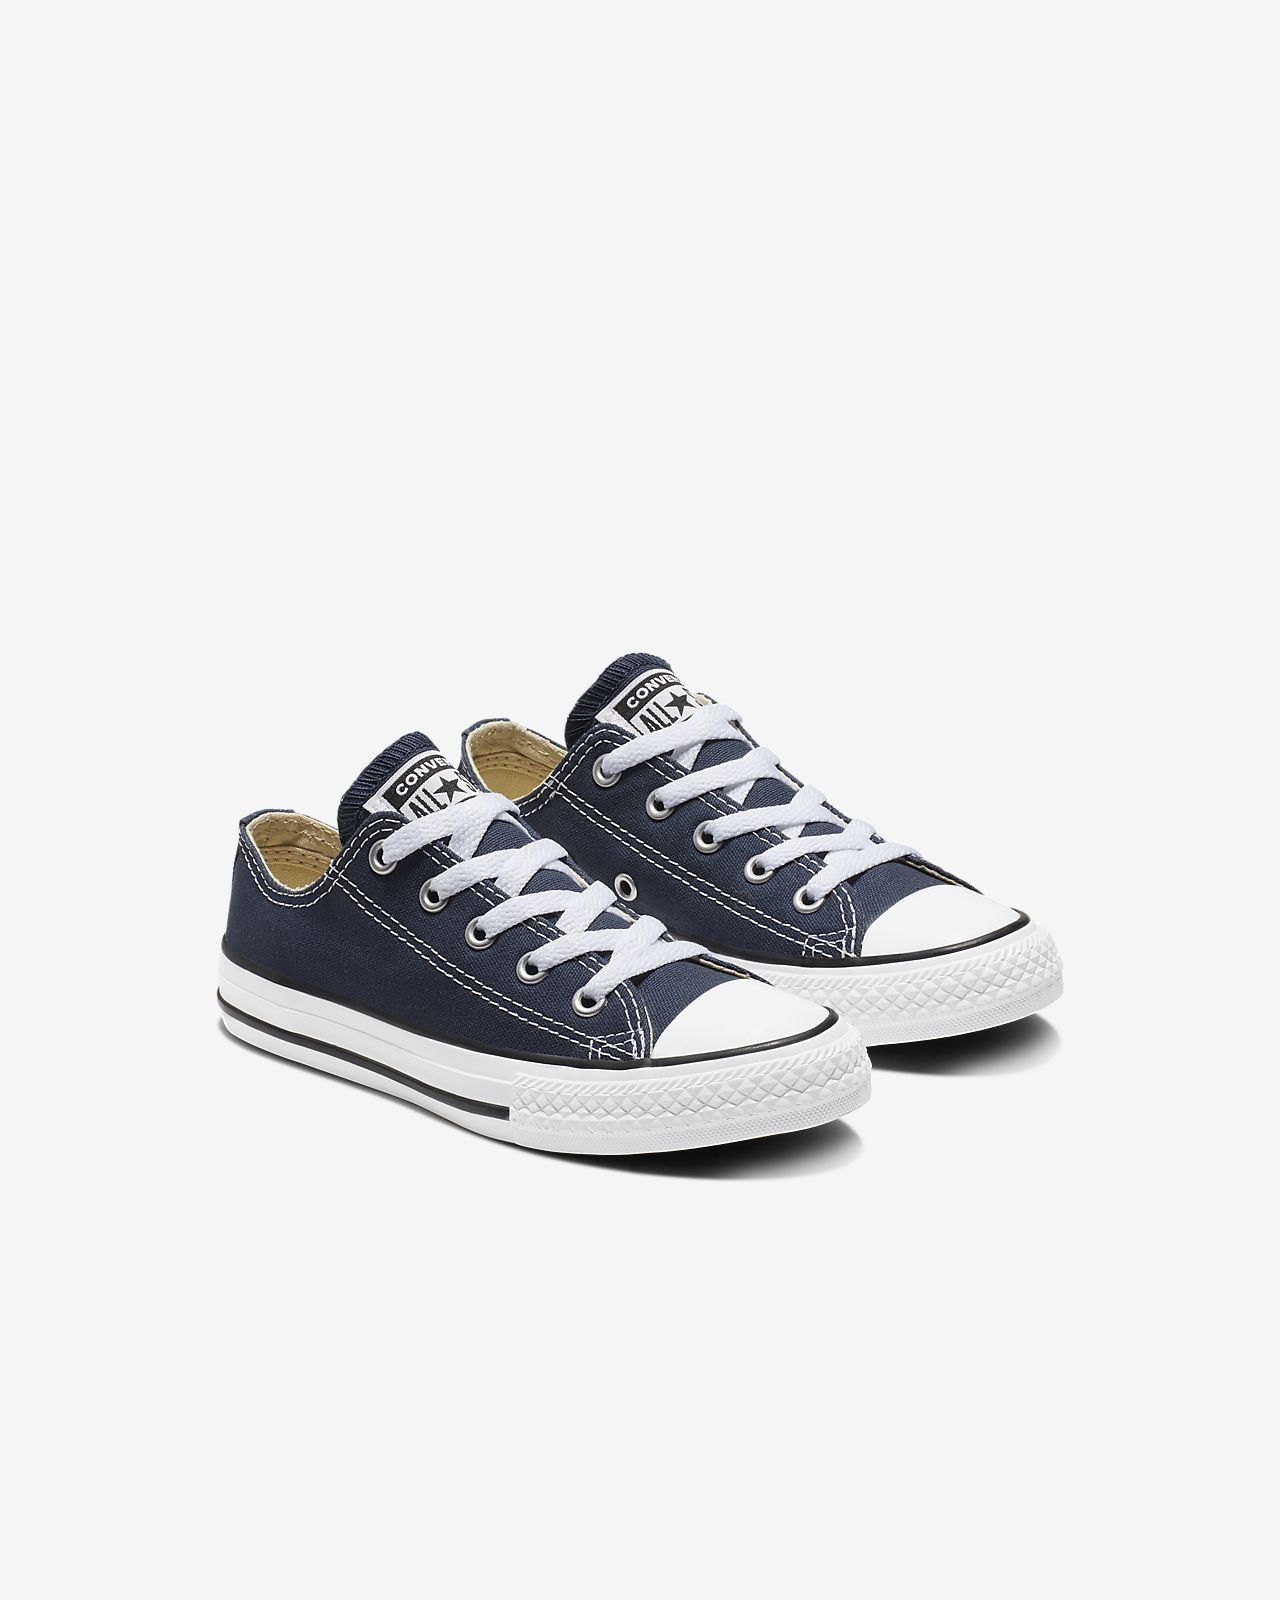 d9d0a140f8 Converse Chuck Taylor All Star Low Top (10.5c-3y) Little Kids' Shoe ...